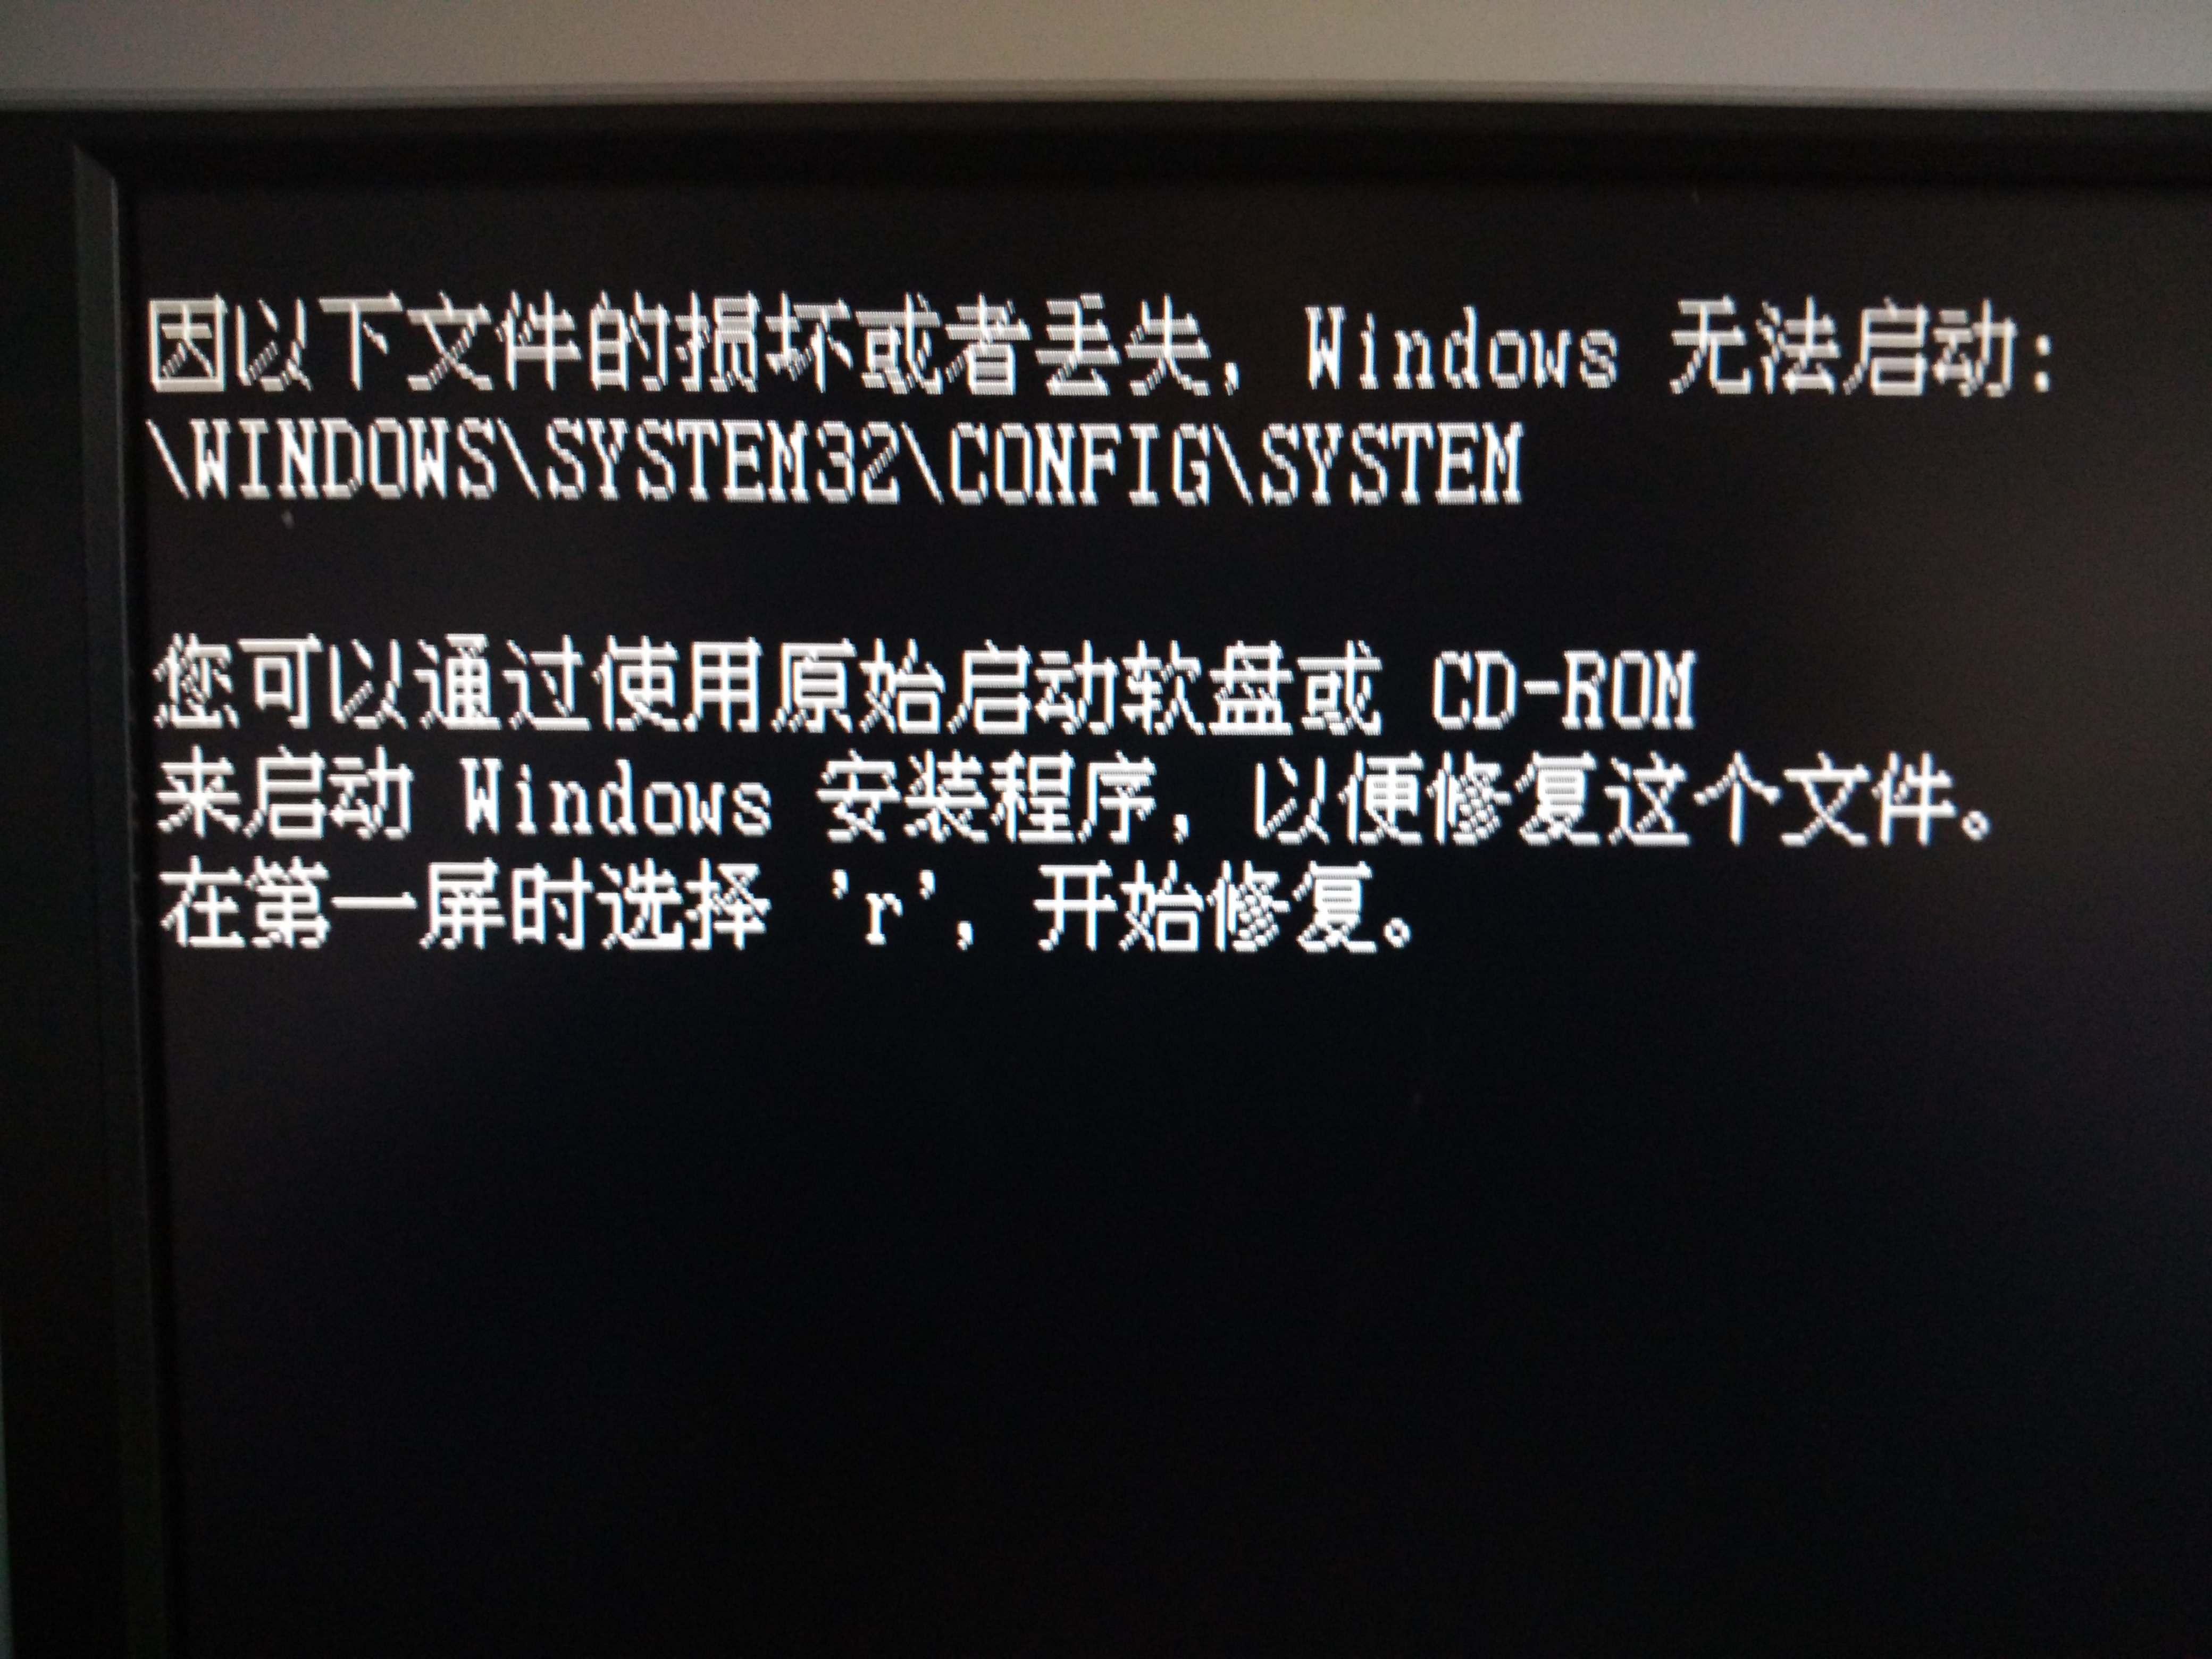 因以下文件损坏或丢失,WINDOWS无法启动 WINDOWS/SYSTEM32/CONFIG/SYSTEM